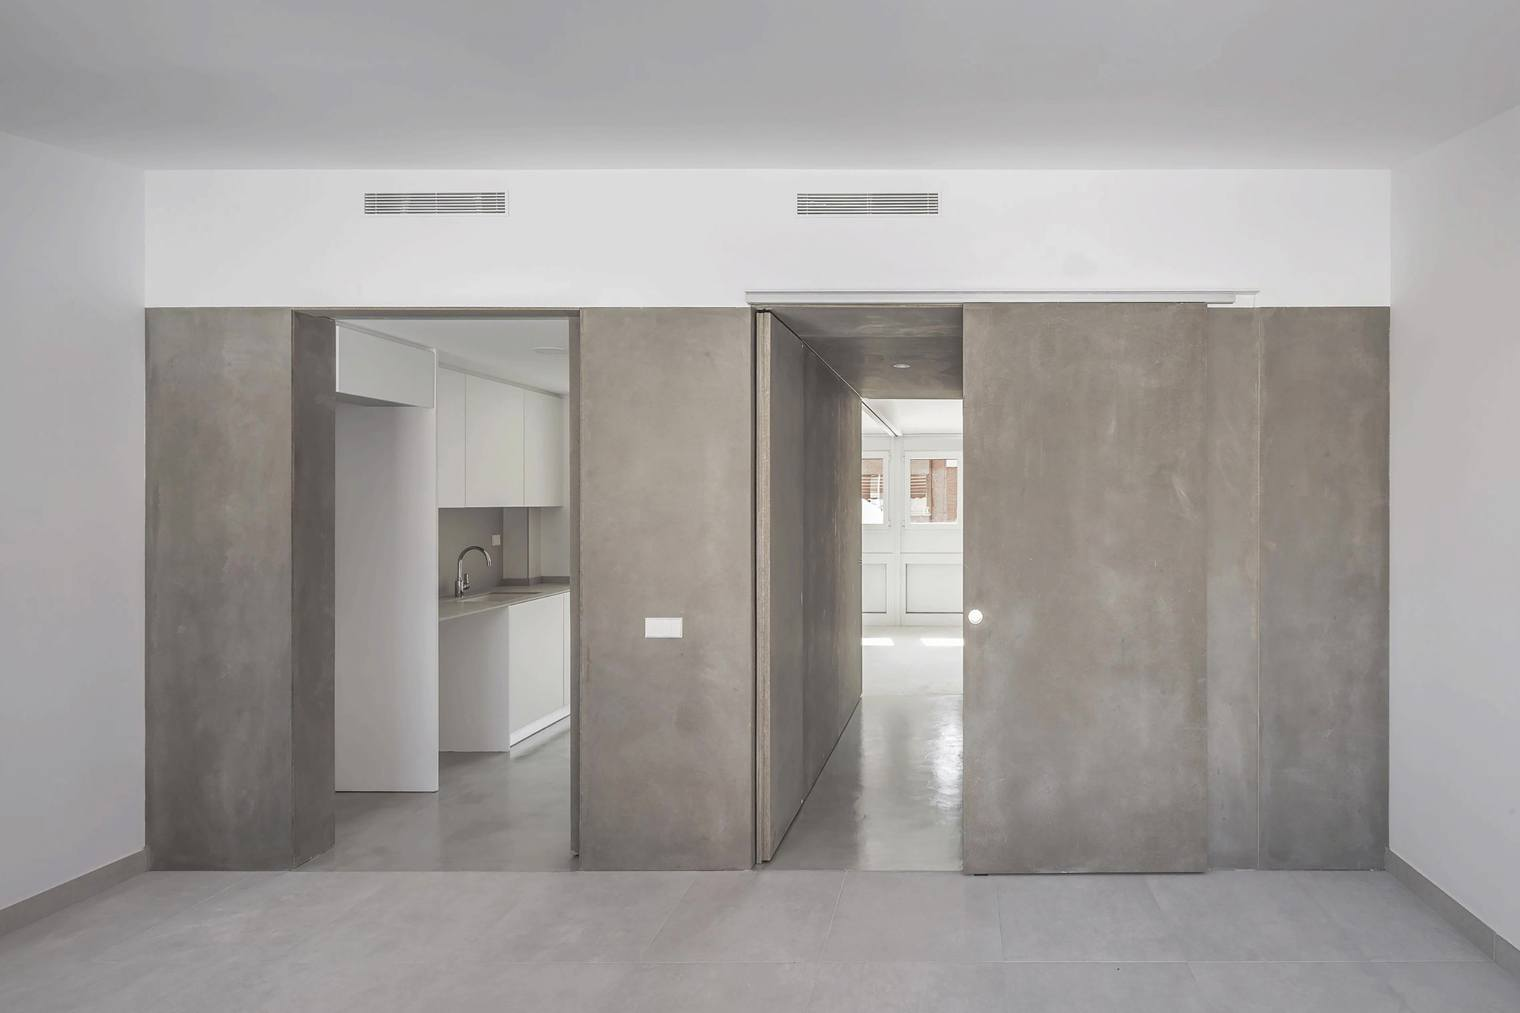 Casa-estudio-torrente-valencia-carrau-carbonell-baviera-llopez-paredes-moviles-abiertas-nucleo-bano-cocina-diariodesign